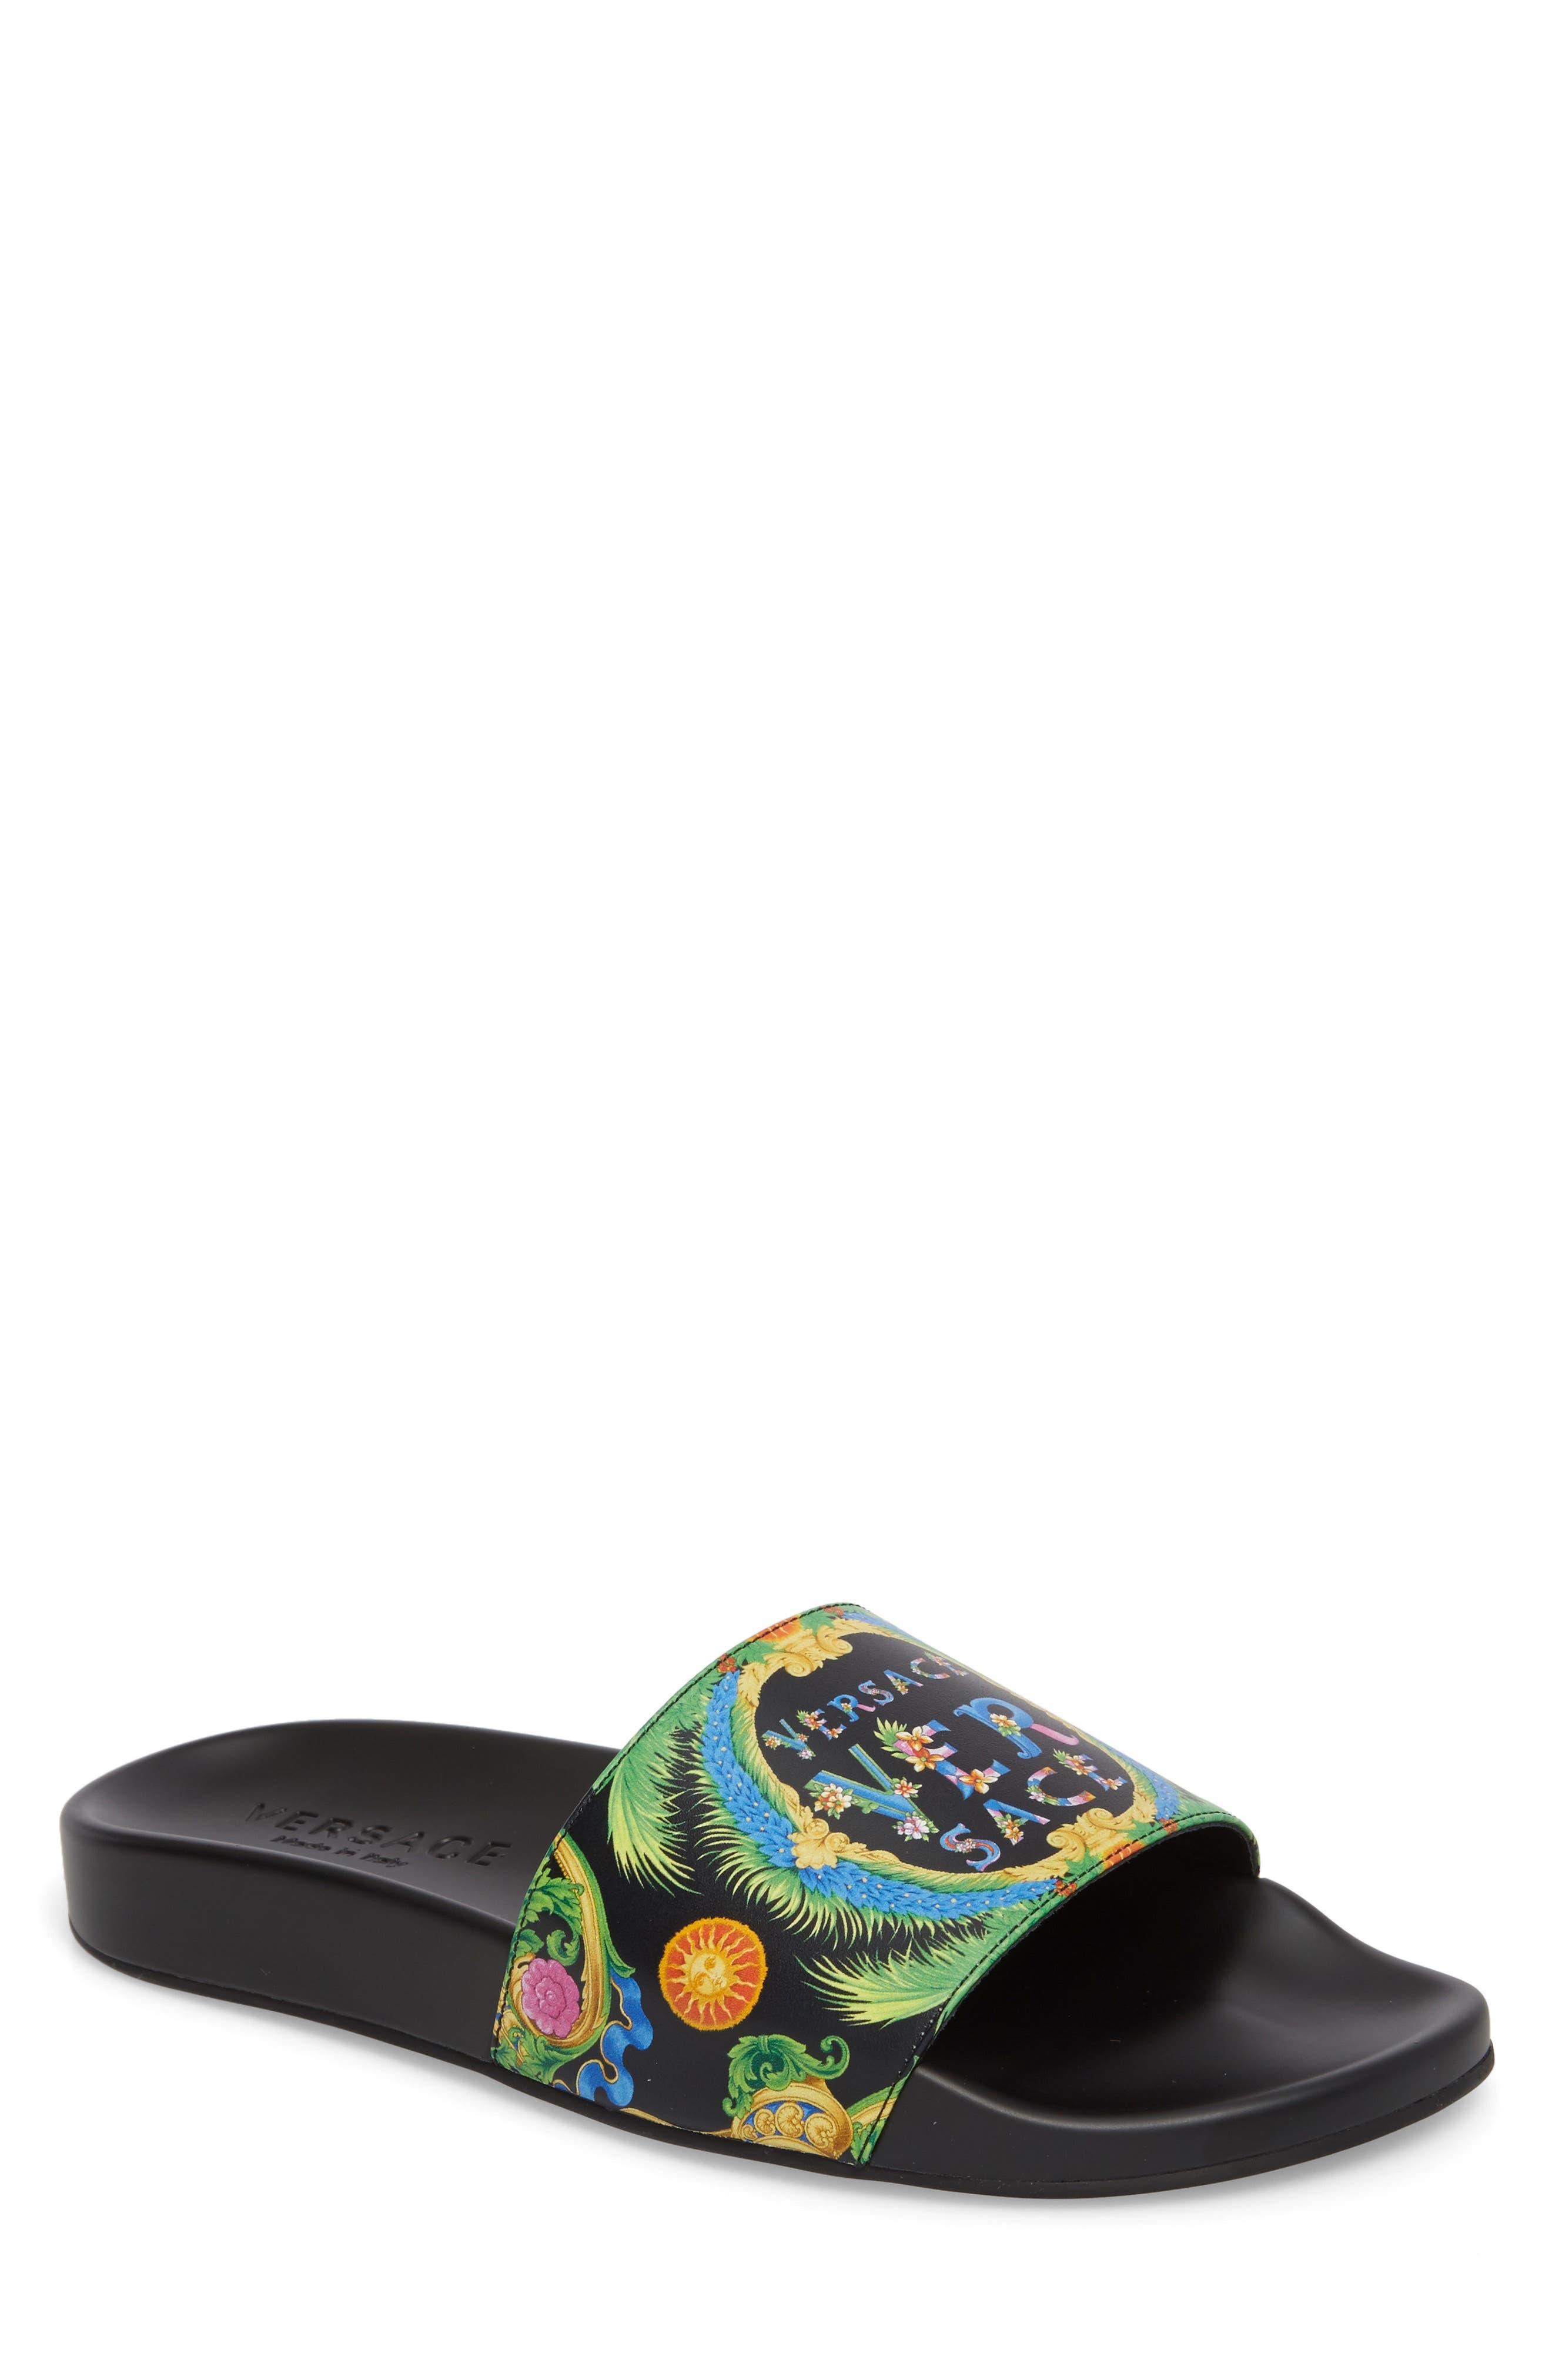 Alternate Image 1 Selected - Versace First Line Miami Slide Sandal (Men)